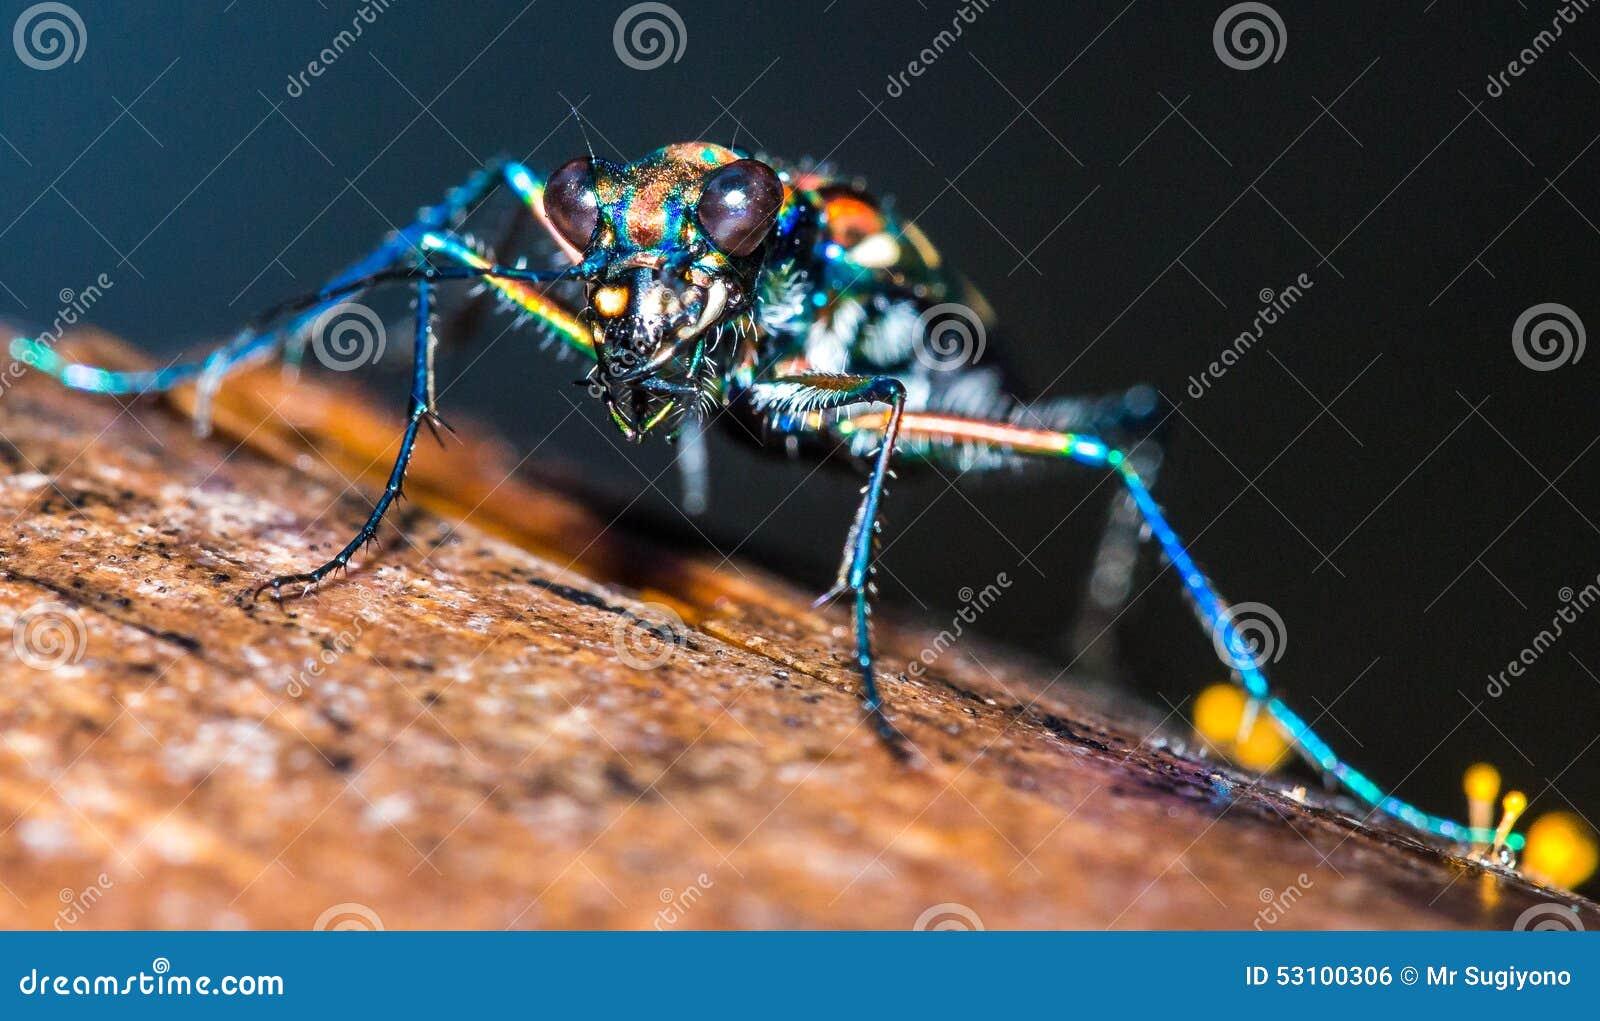 Indonesian Tiger Bug stock photo. Image of java, indonesia - 53100306